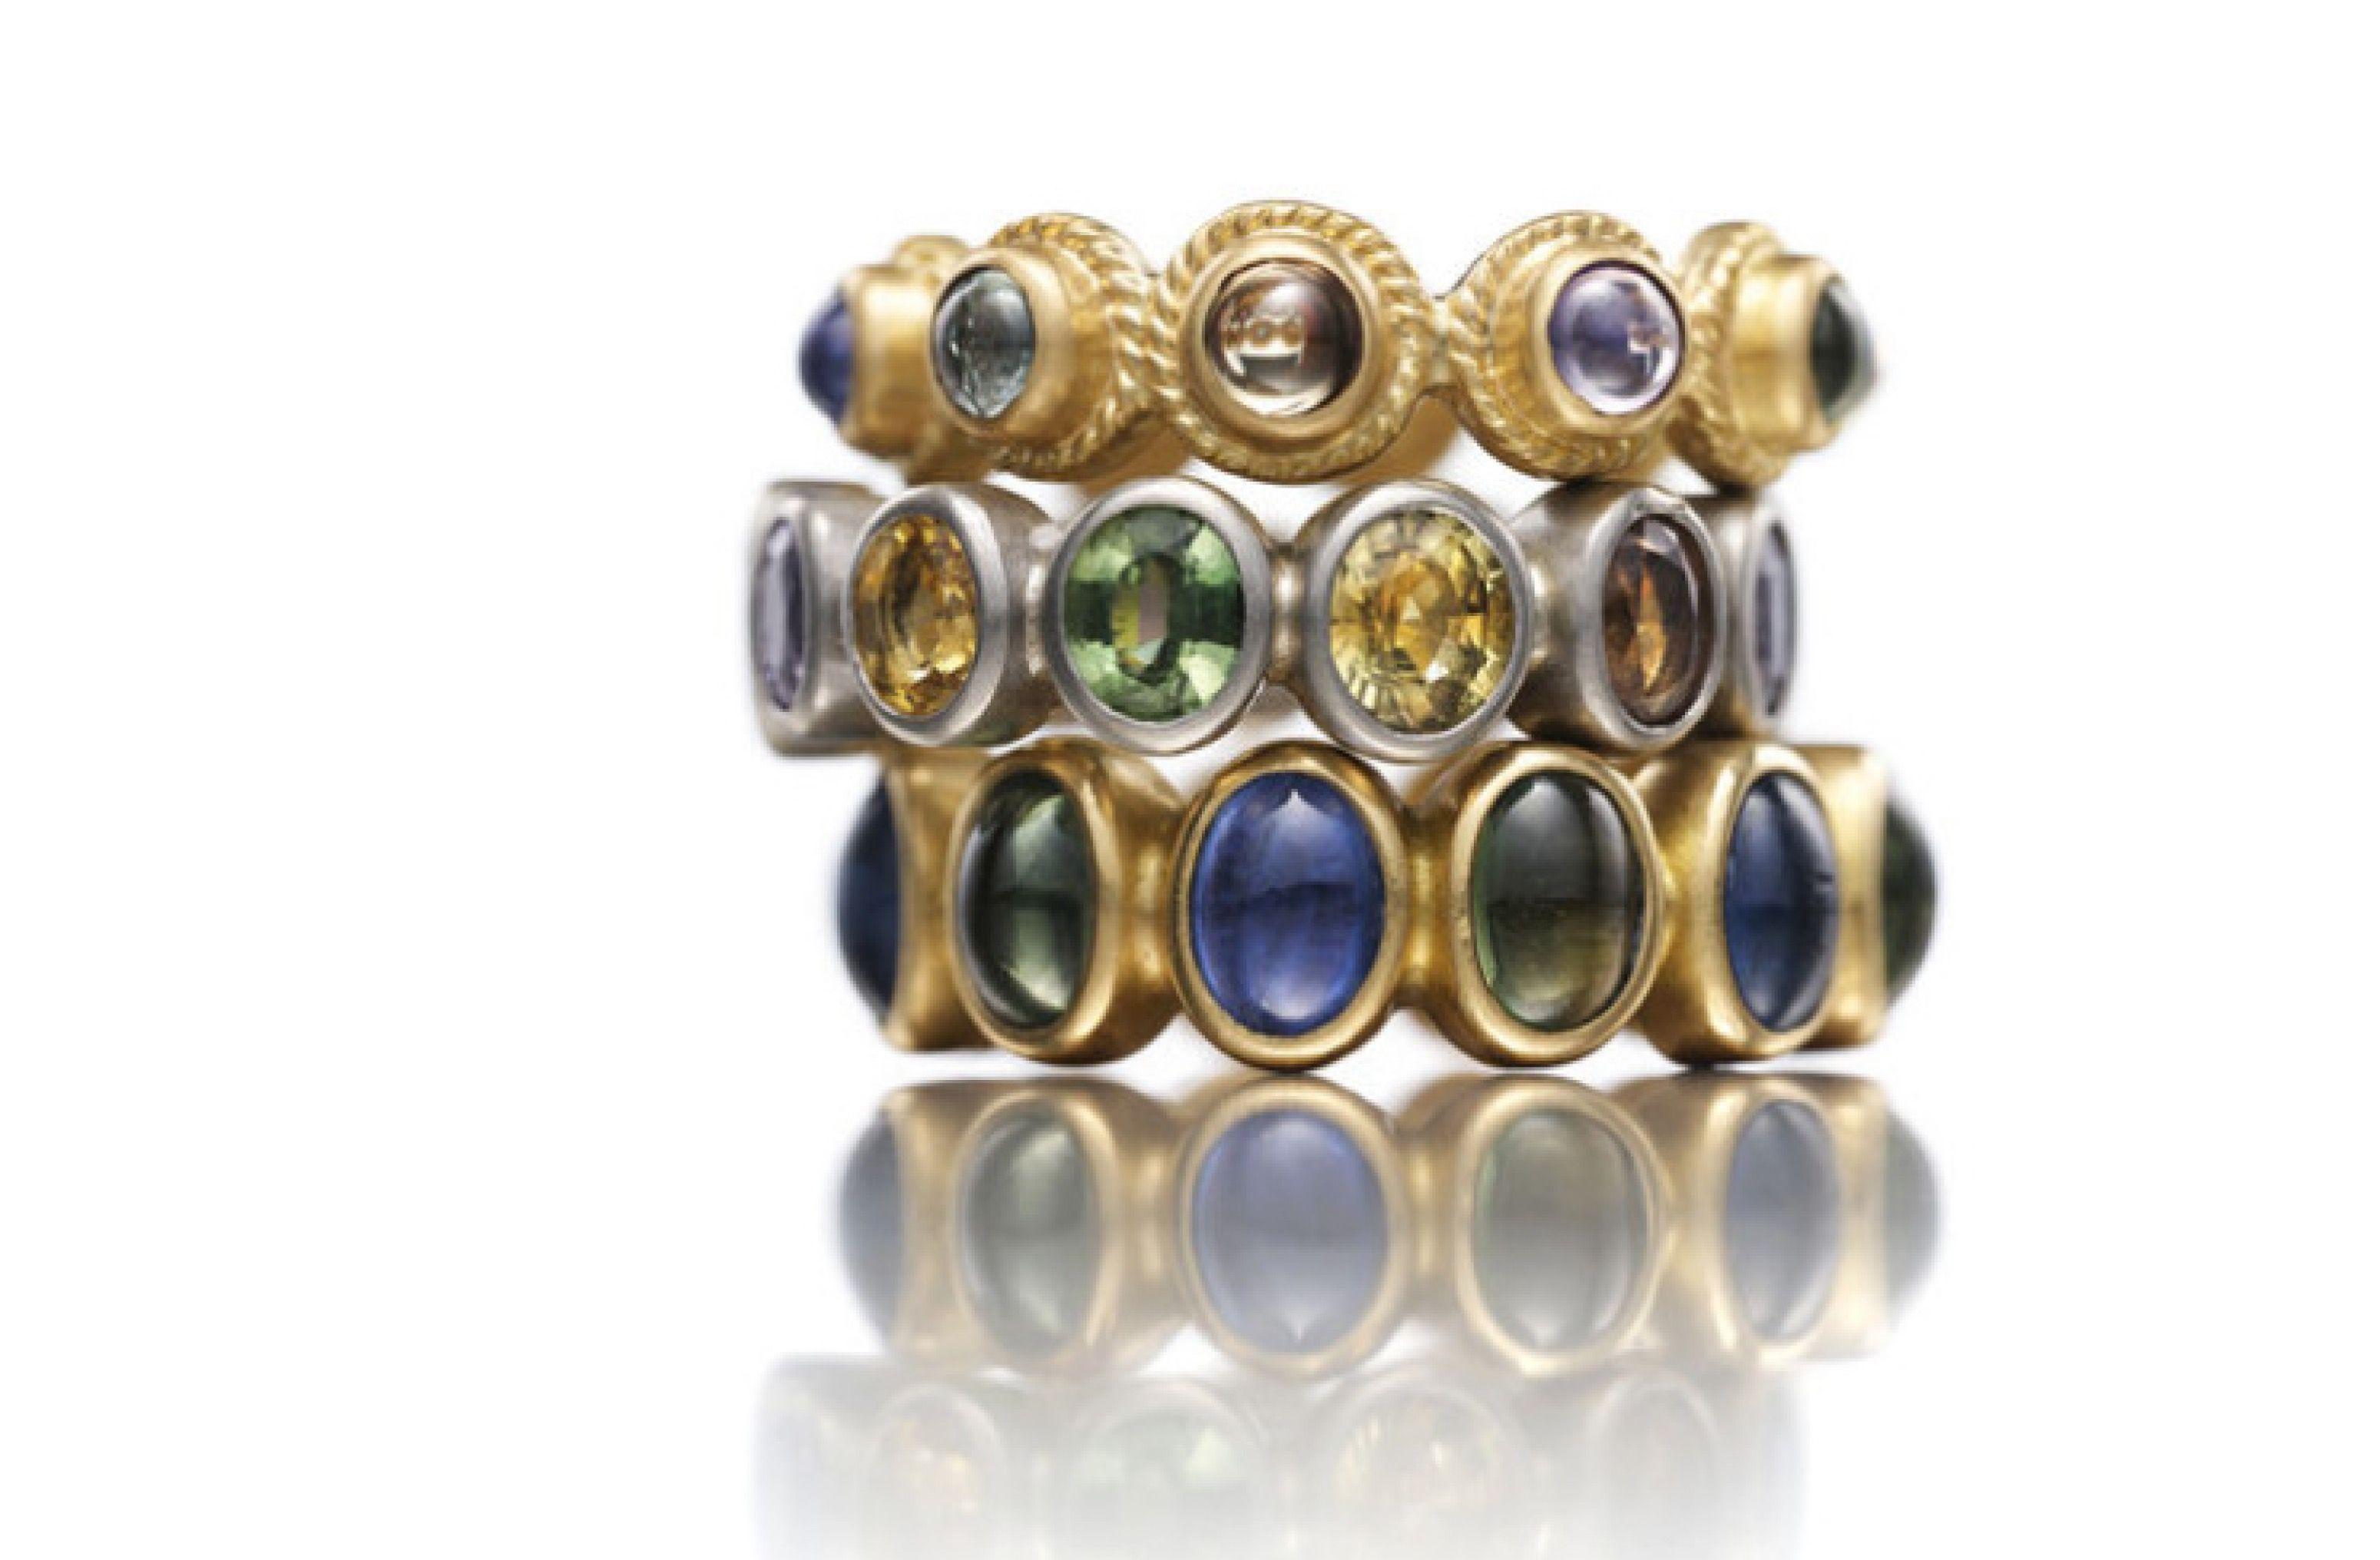 JewelryWhite_10.jpg